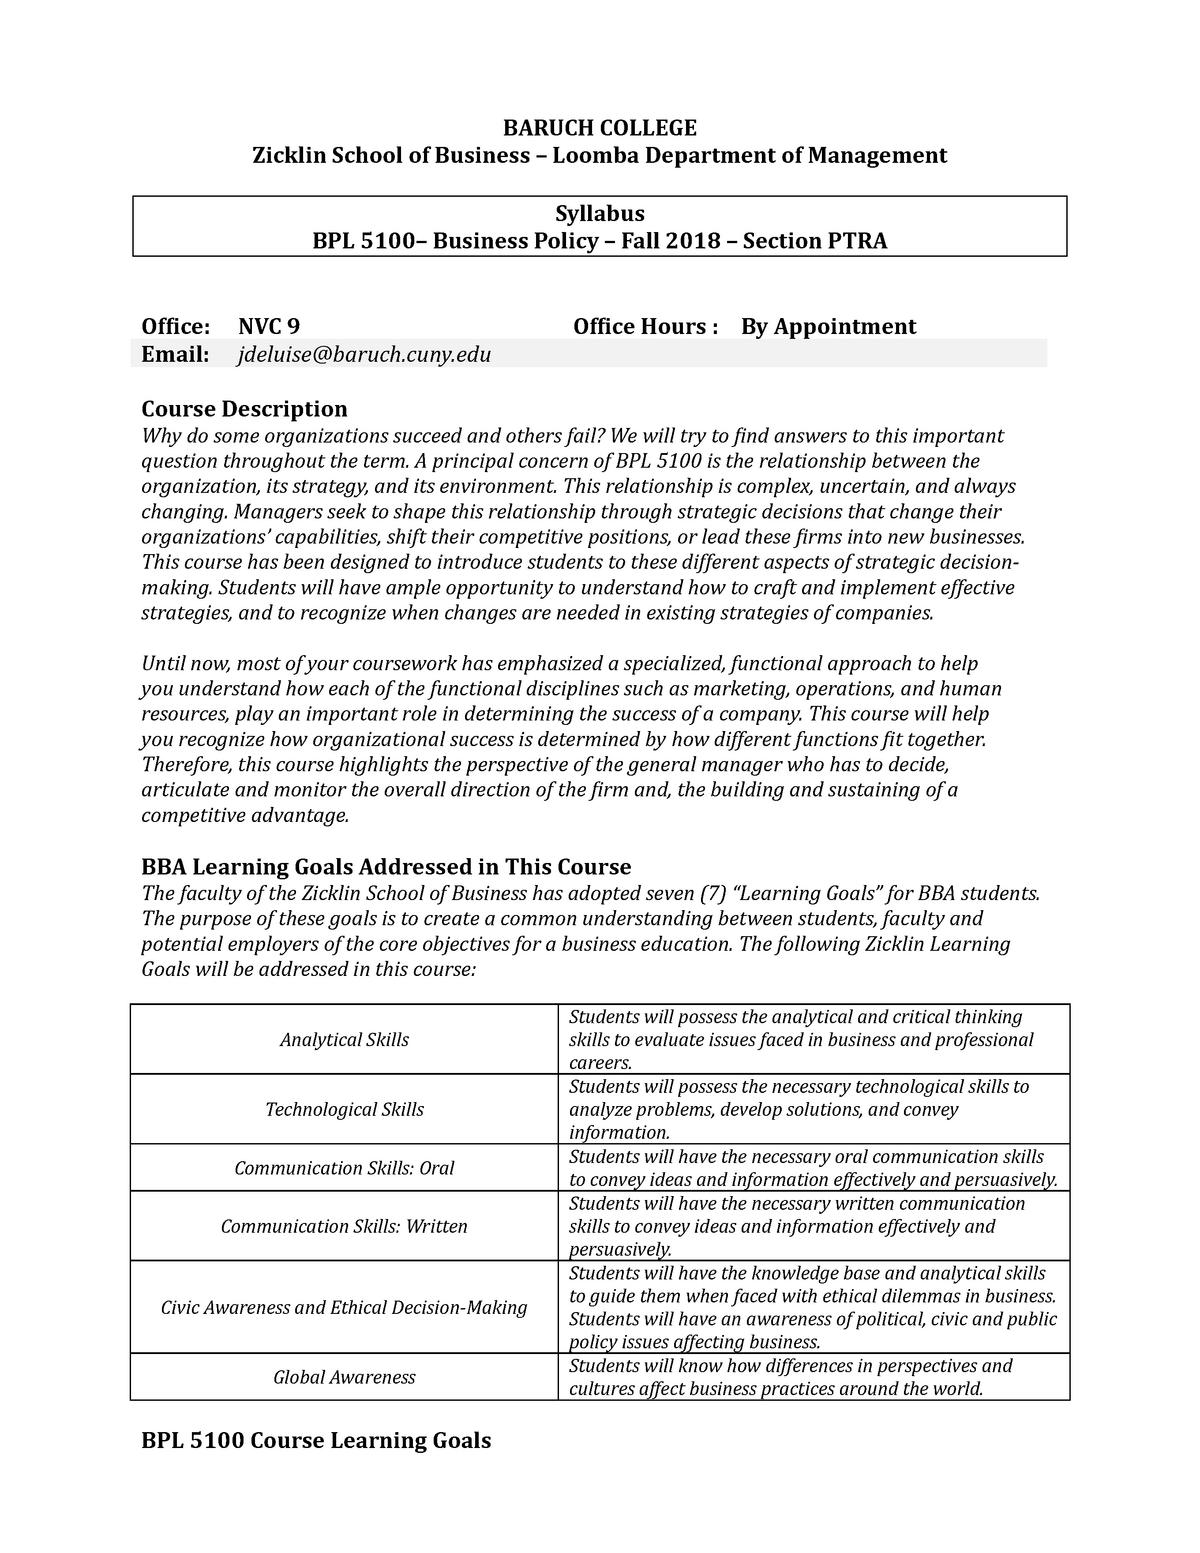 BPL-5100 Fall-2018-Syllabus-Version-B-8-22 (2) (1)(1) - StuDocu